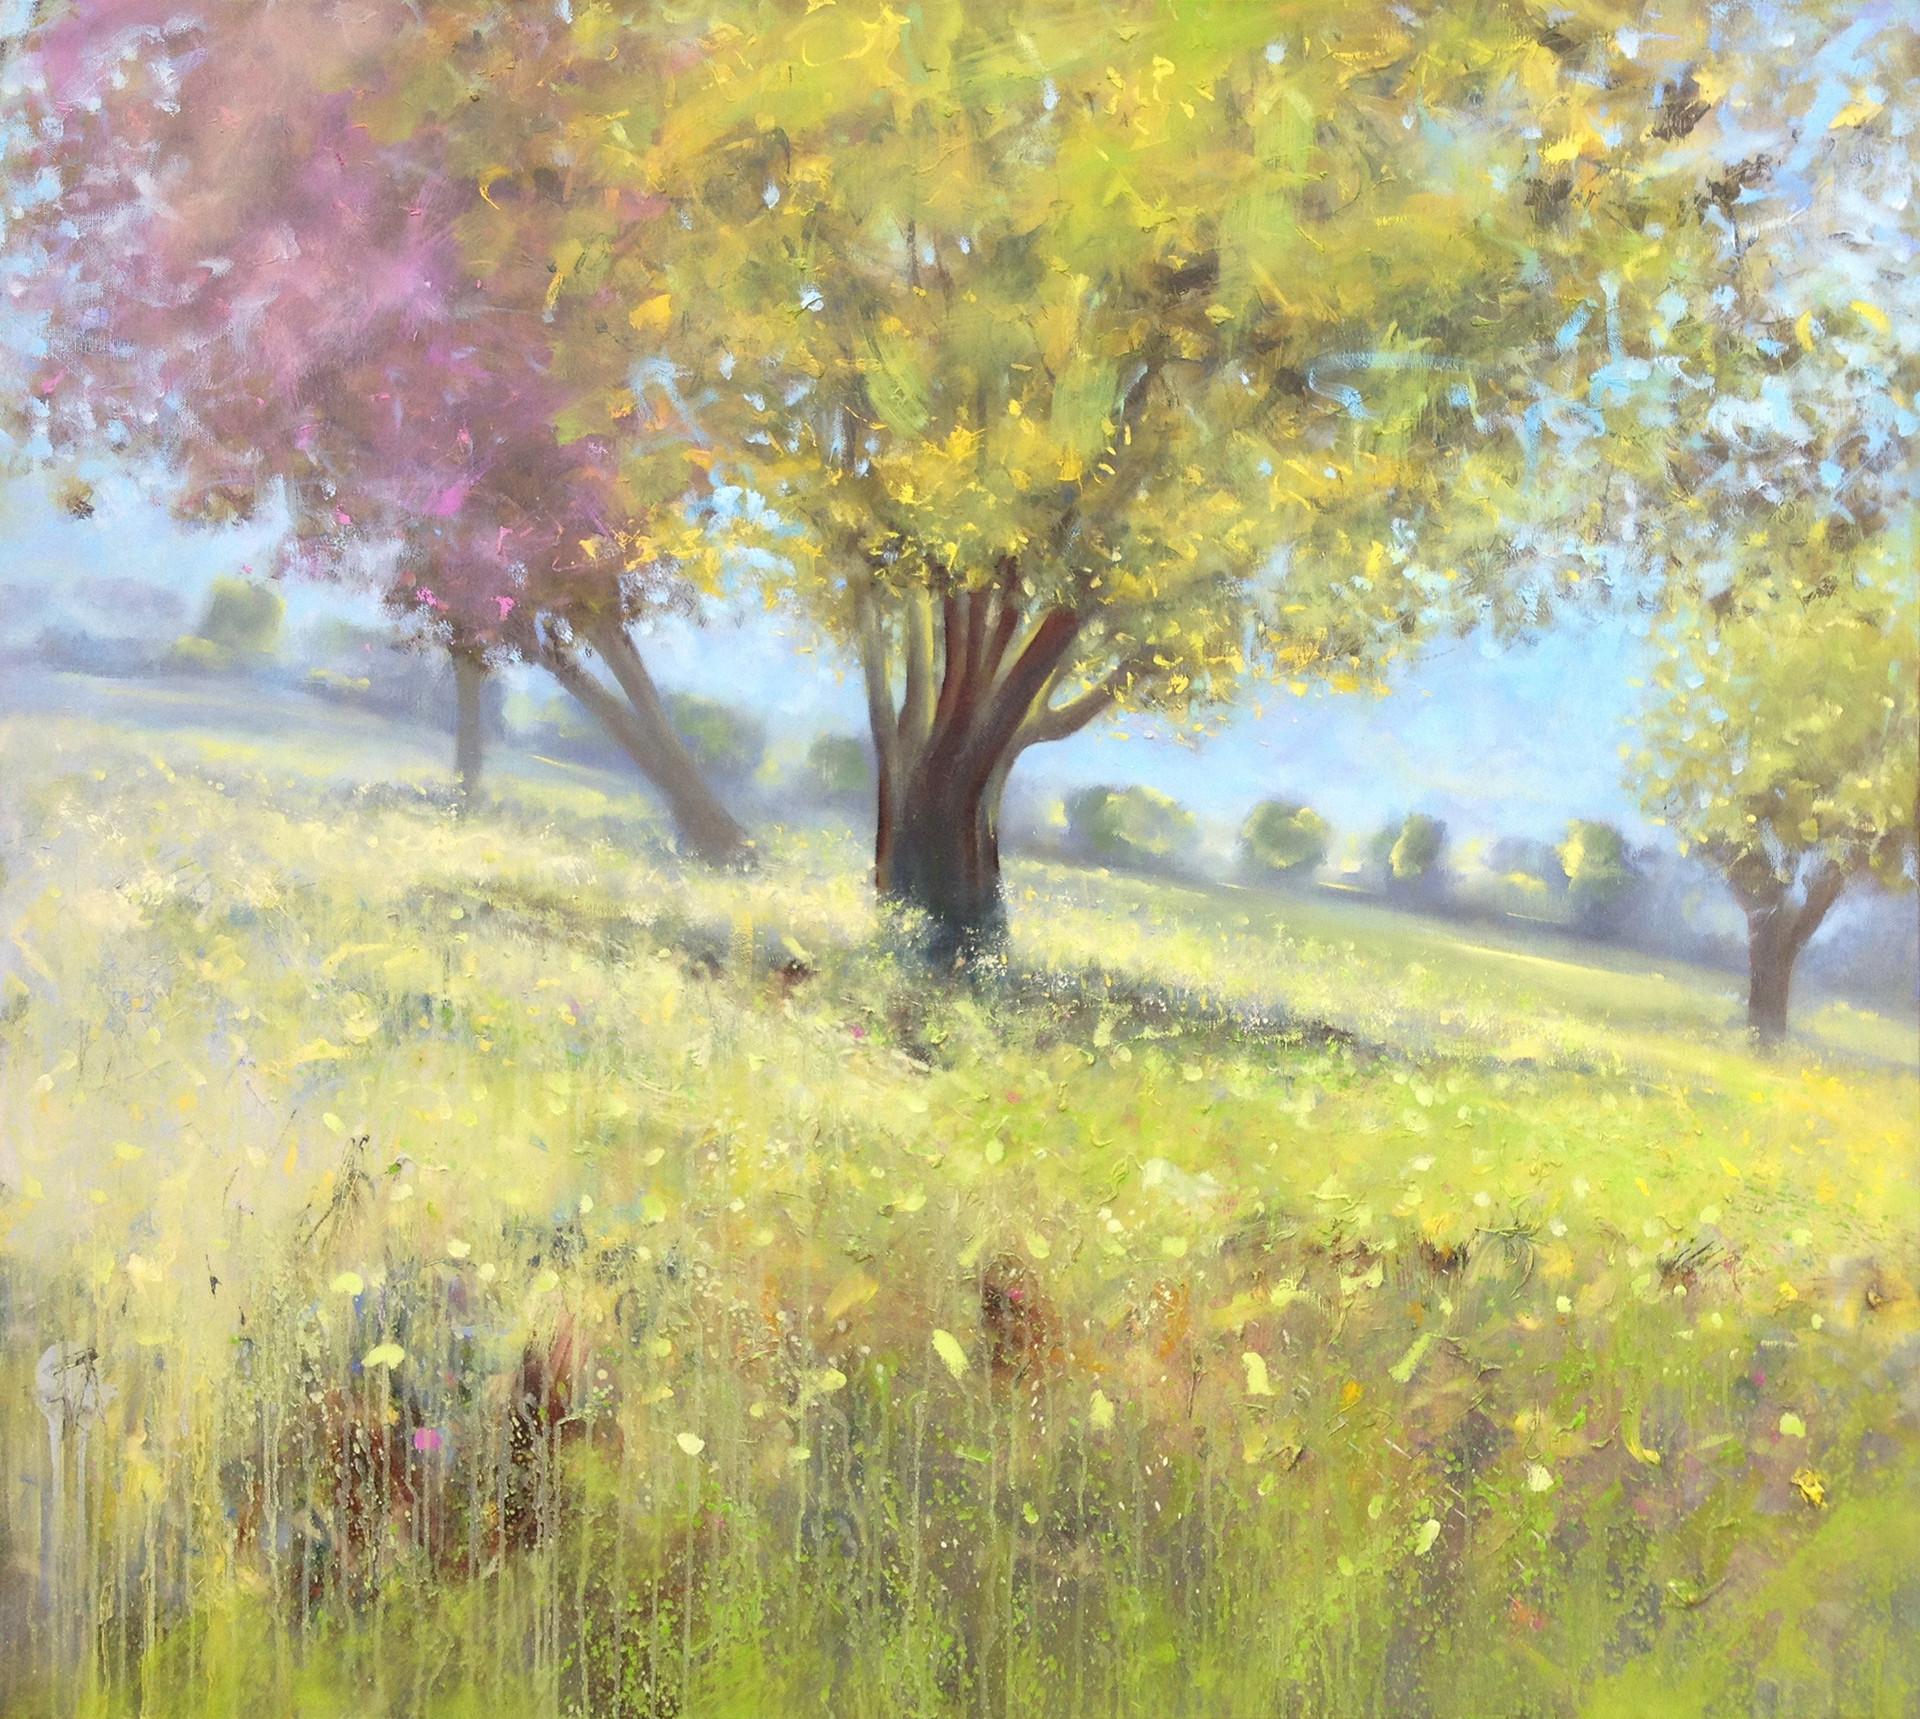 Carob tree and mustard  eld Emek HaEllah